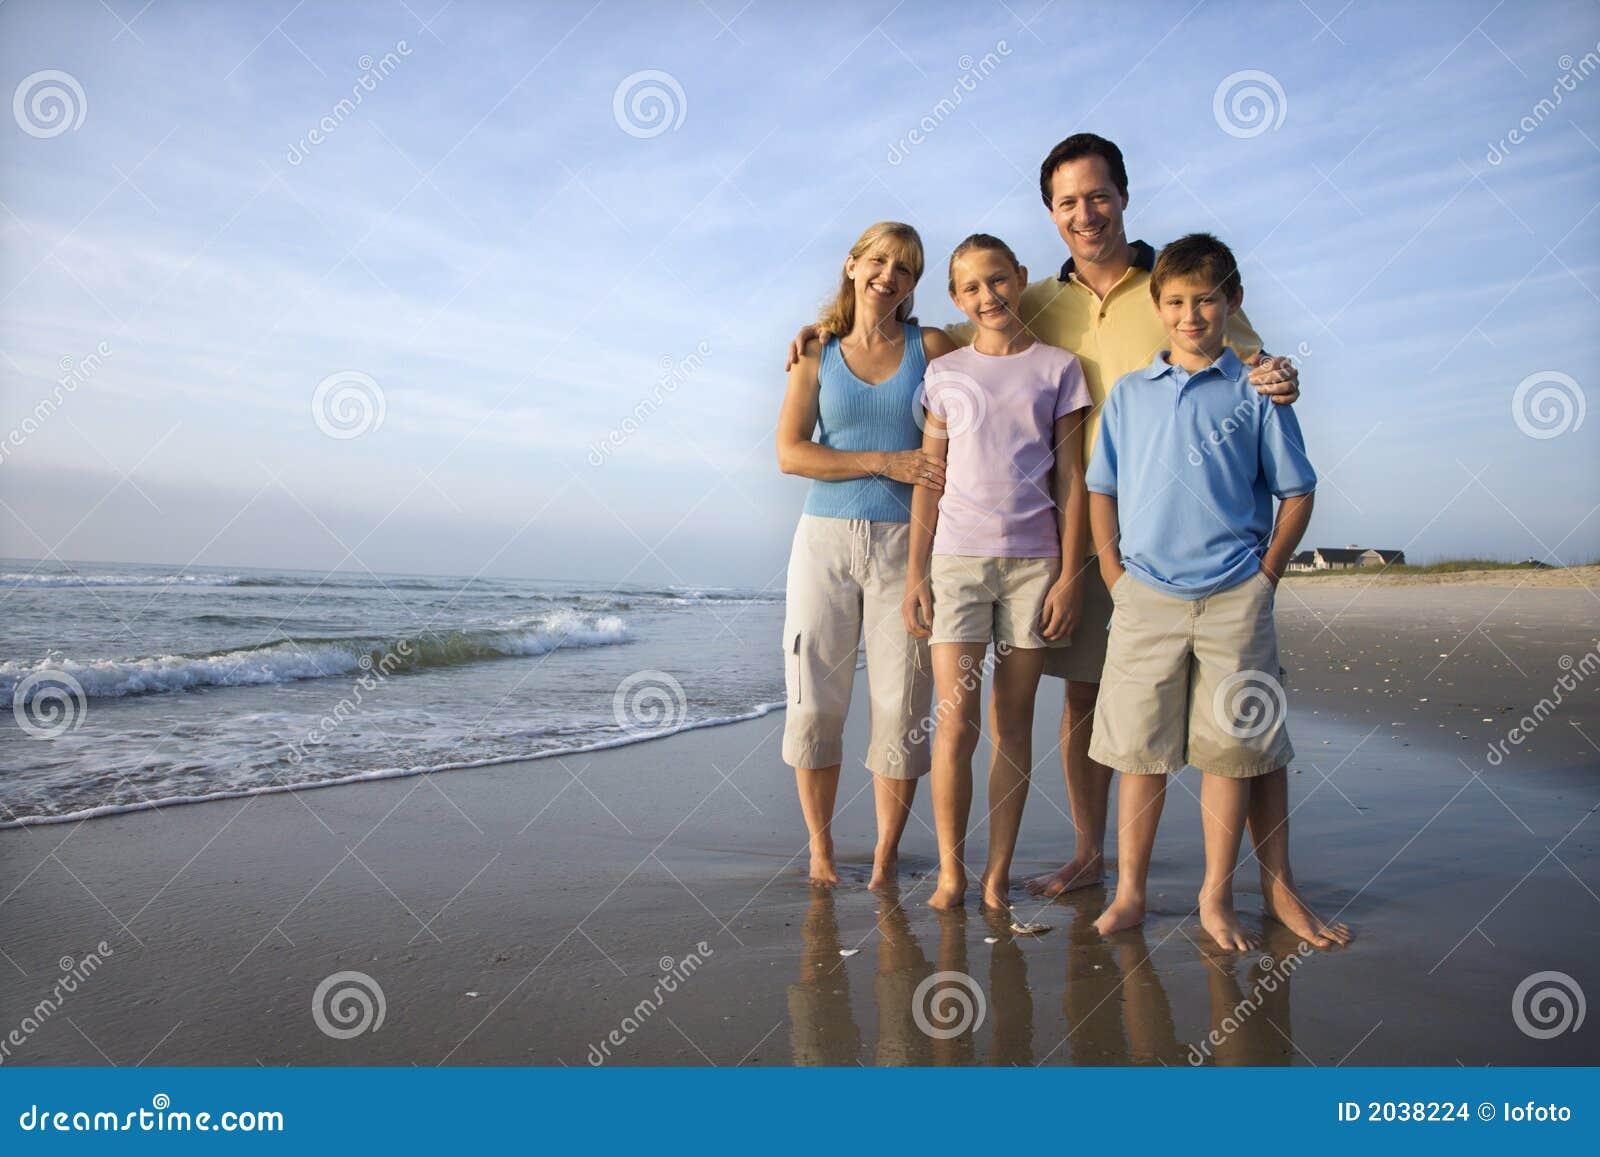 в контакте фото с пляжа